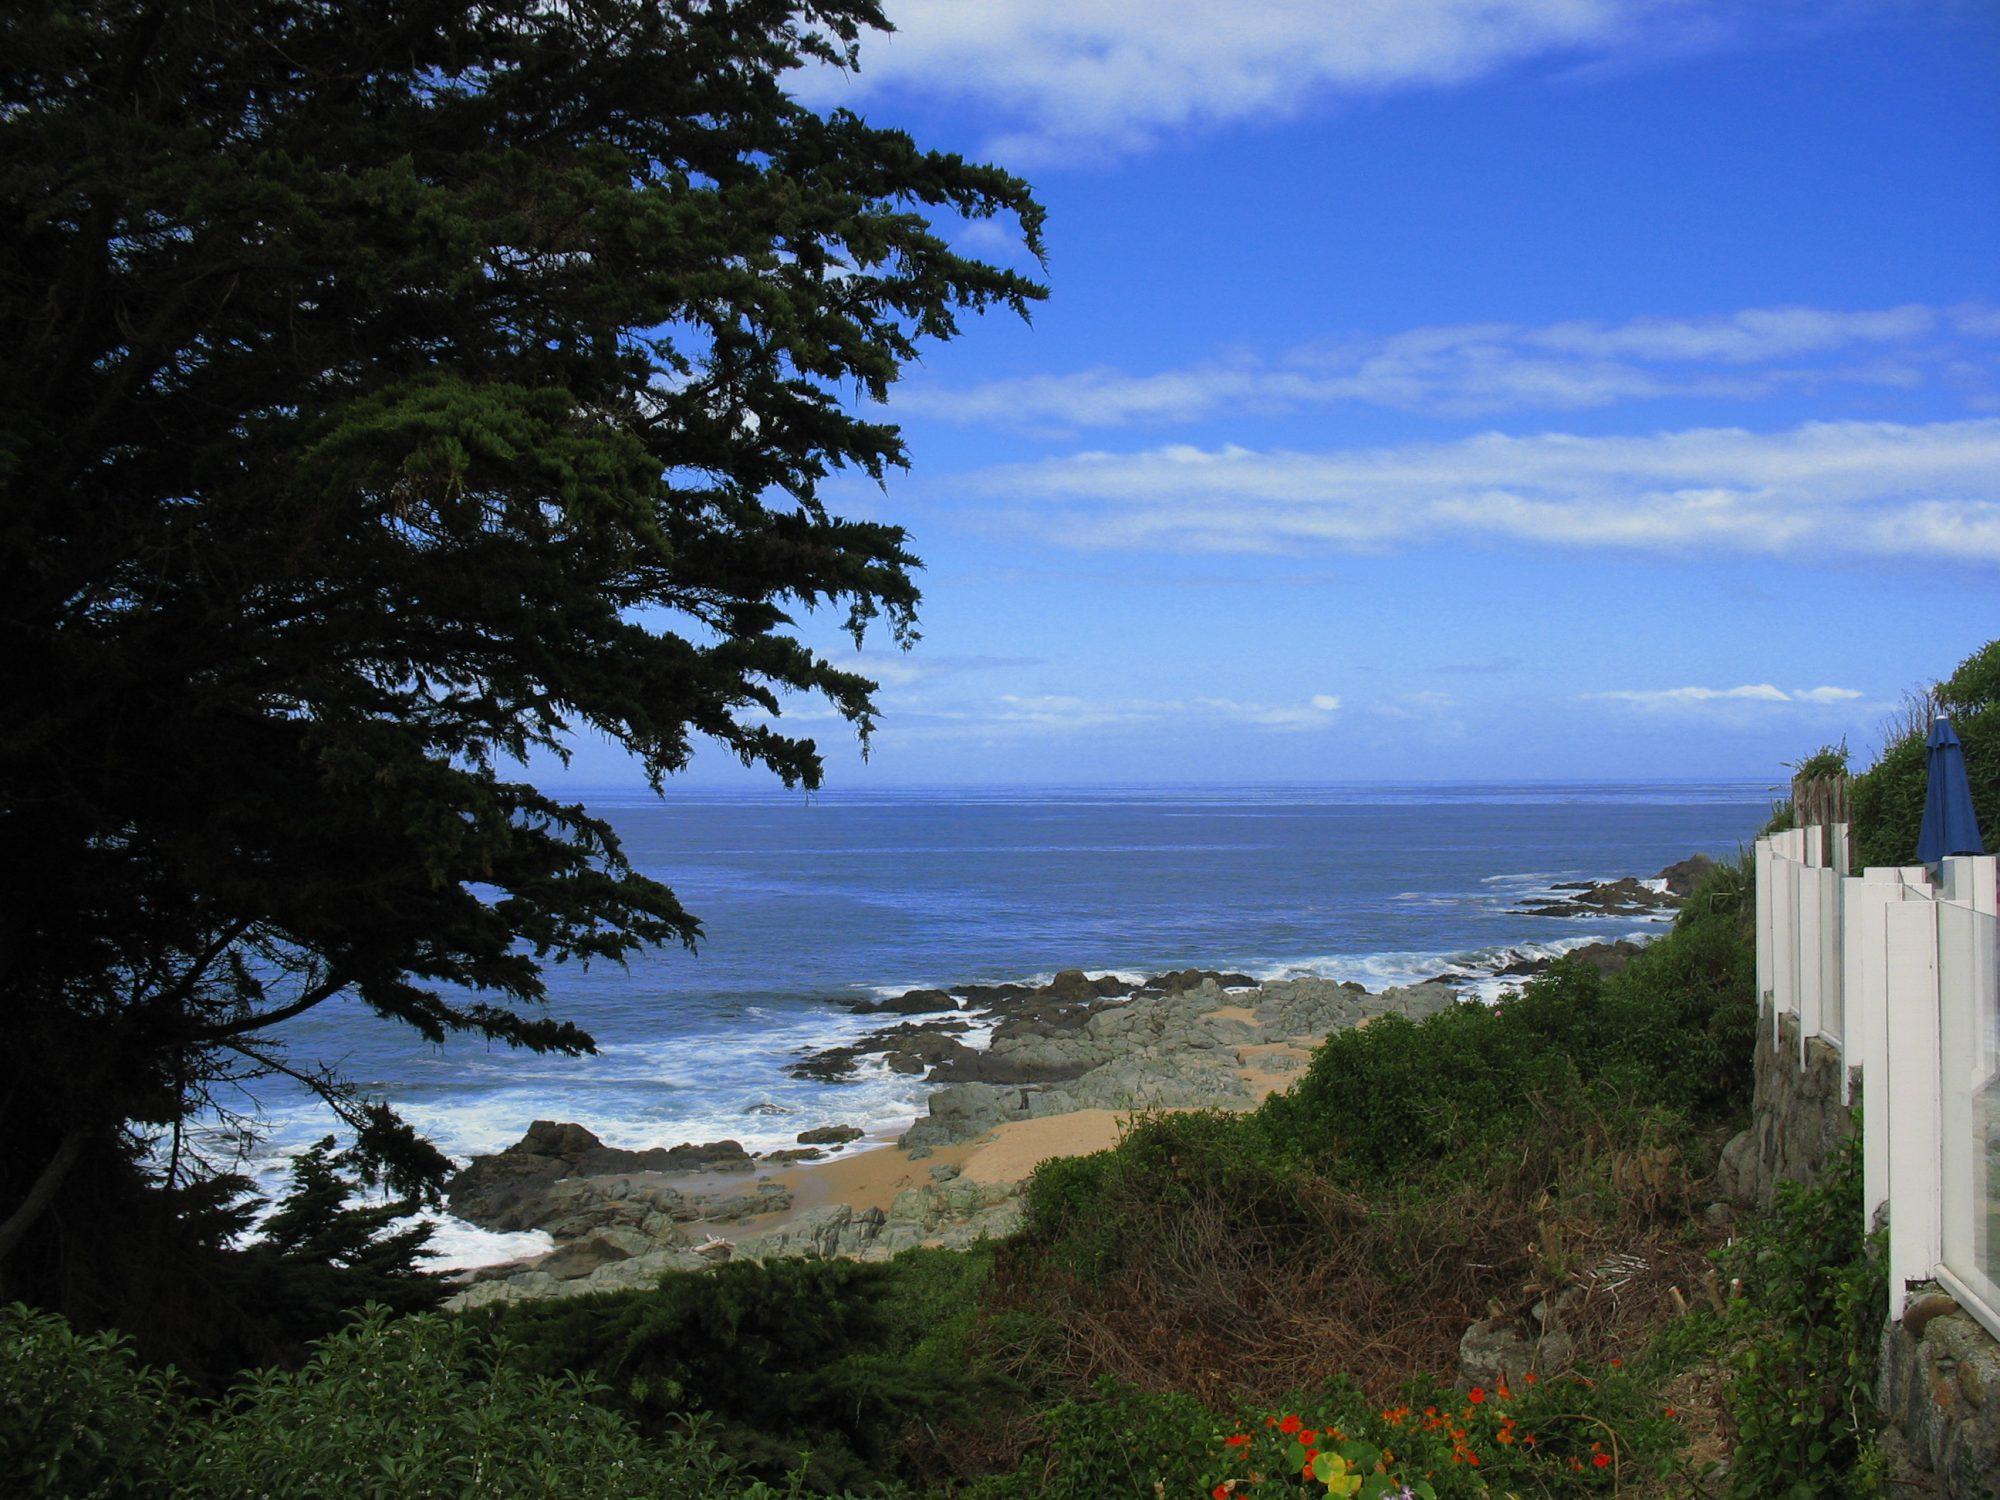 Chile -Isla Negra - Pablo Neruda